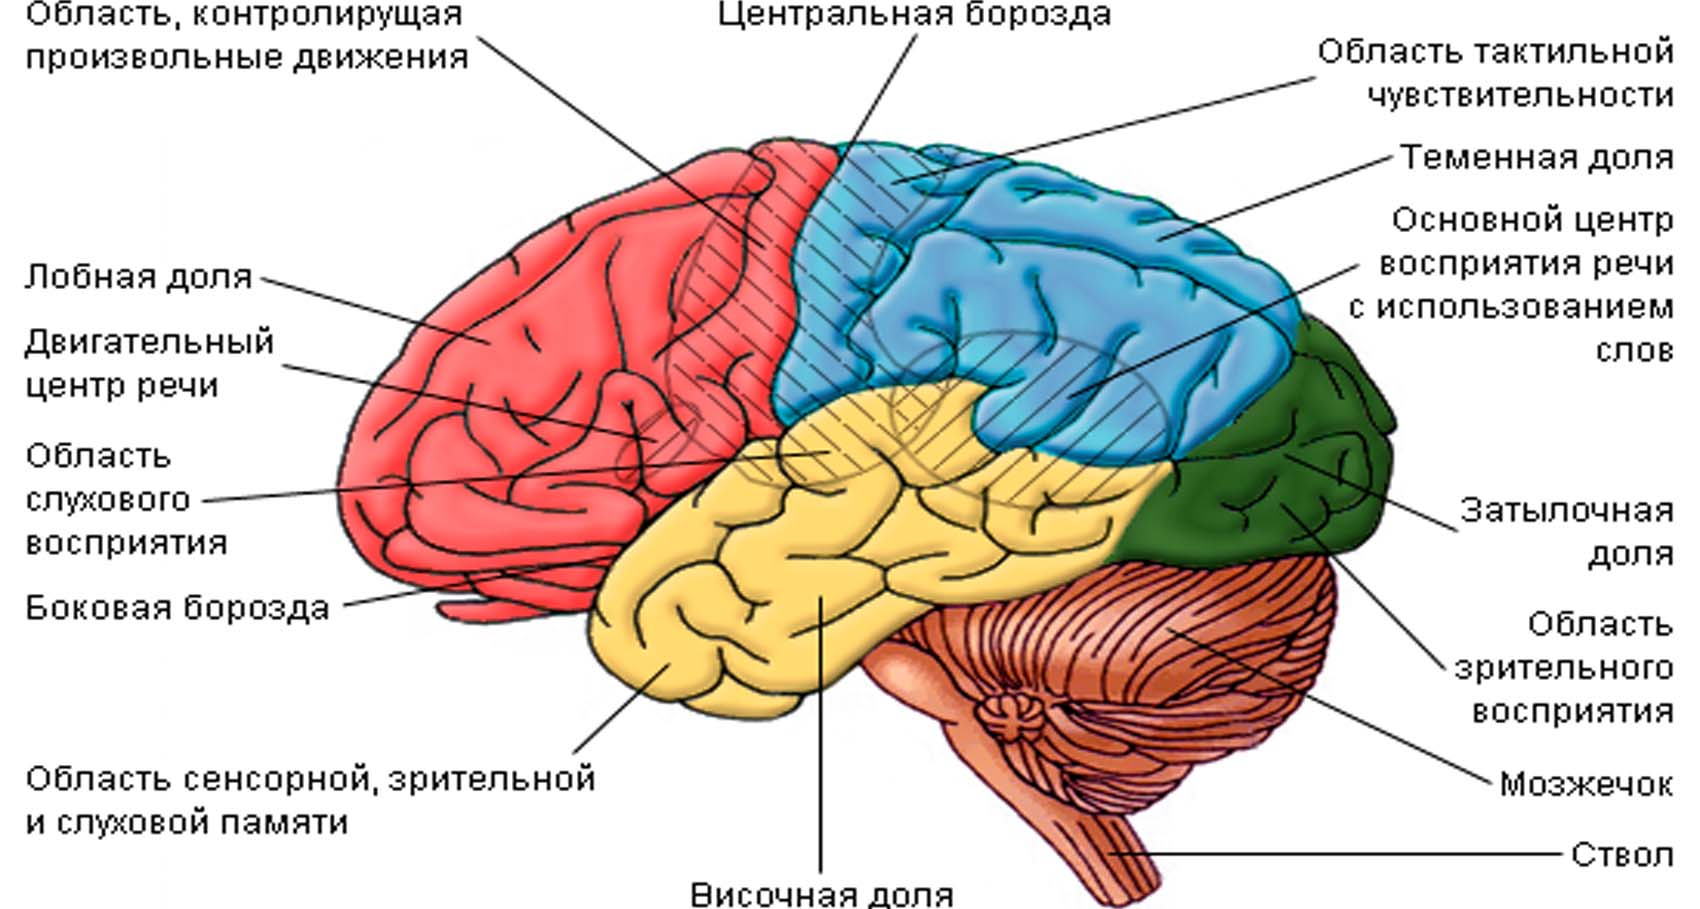 Области мозга и их функции